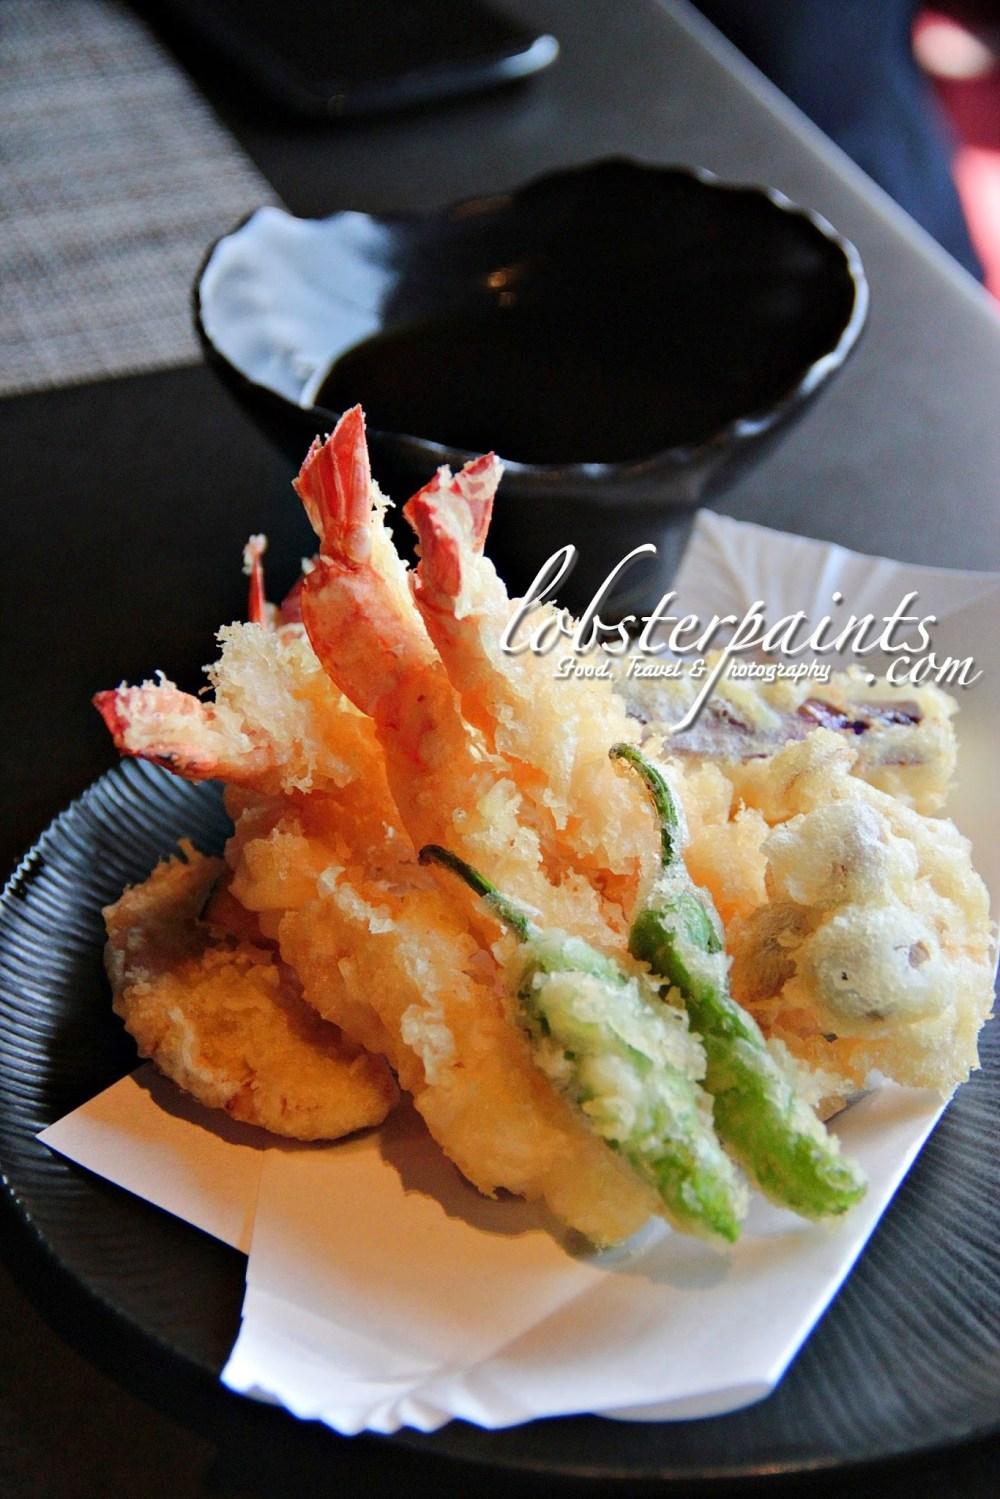 雜錦天婦羅 @ 天 Sky 21 Bar & Restaurant   Macau, China